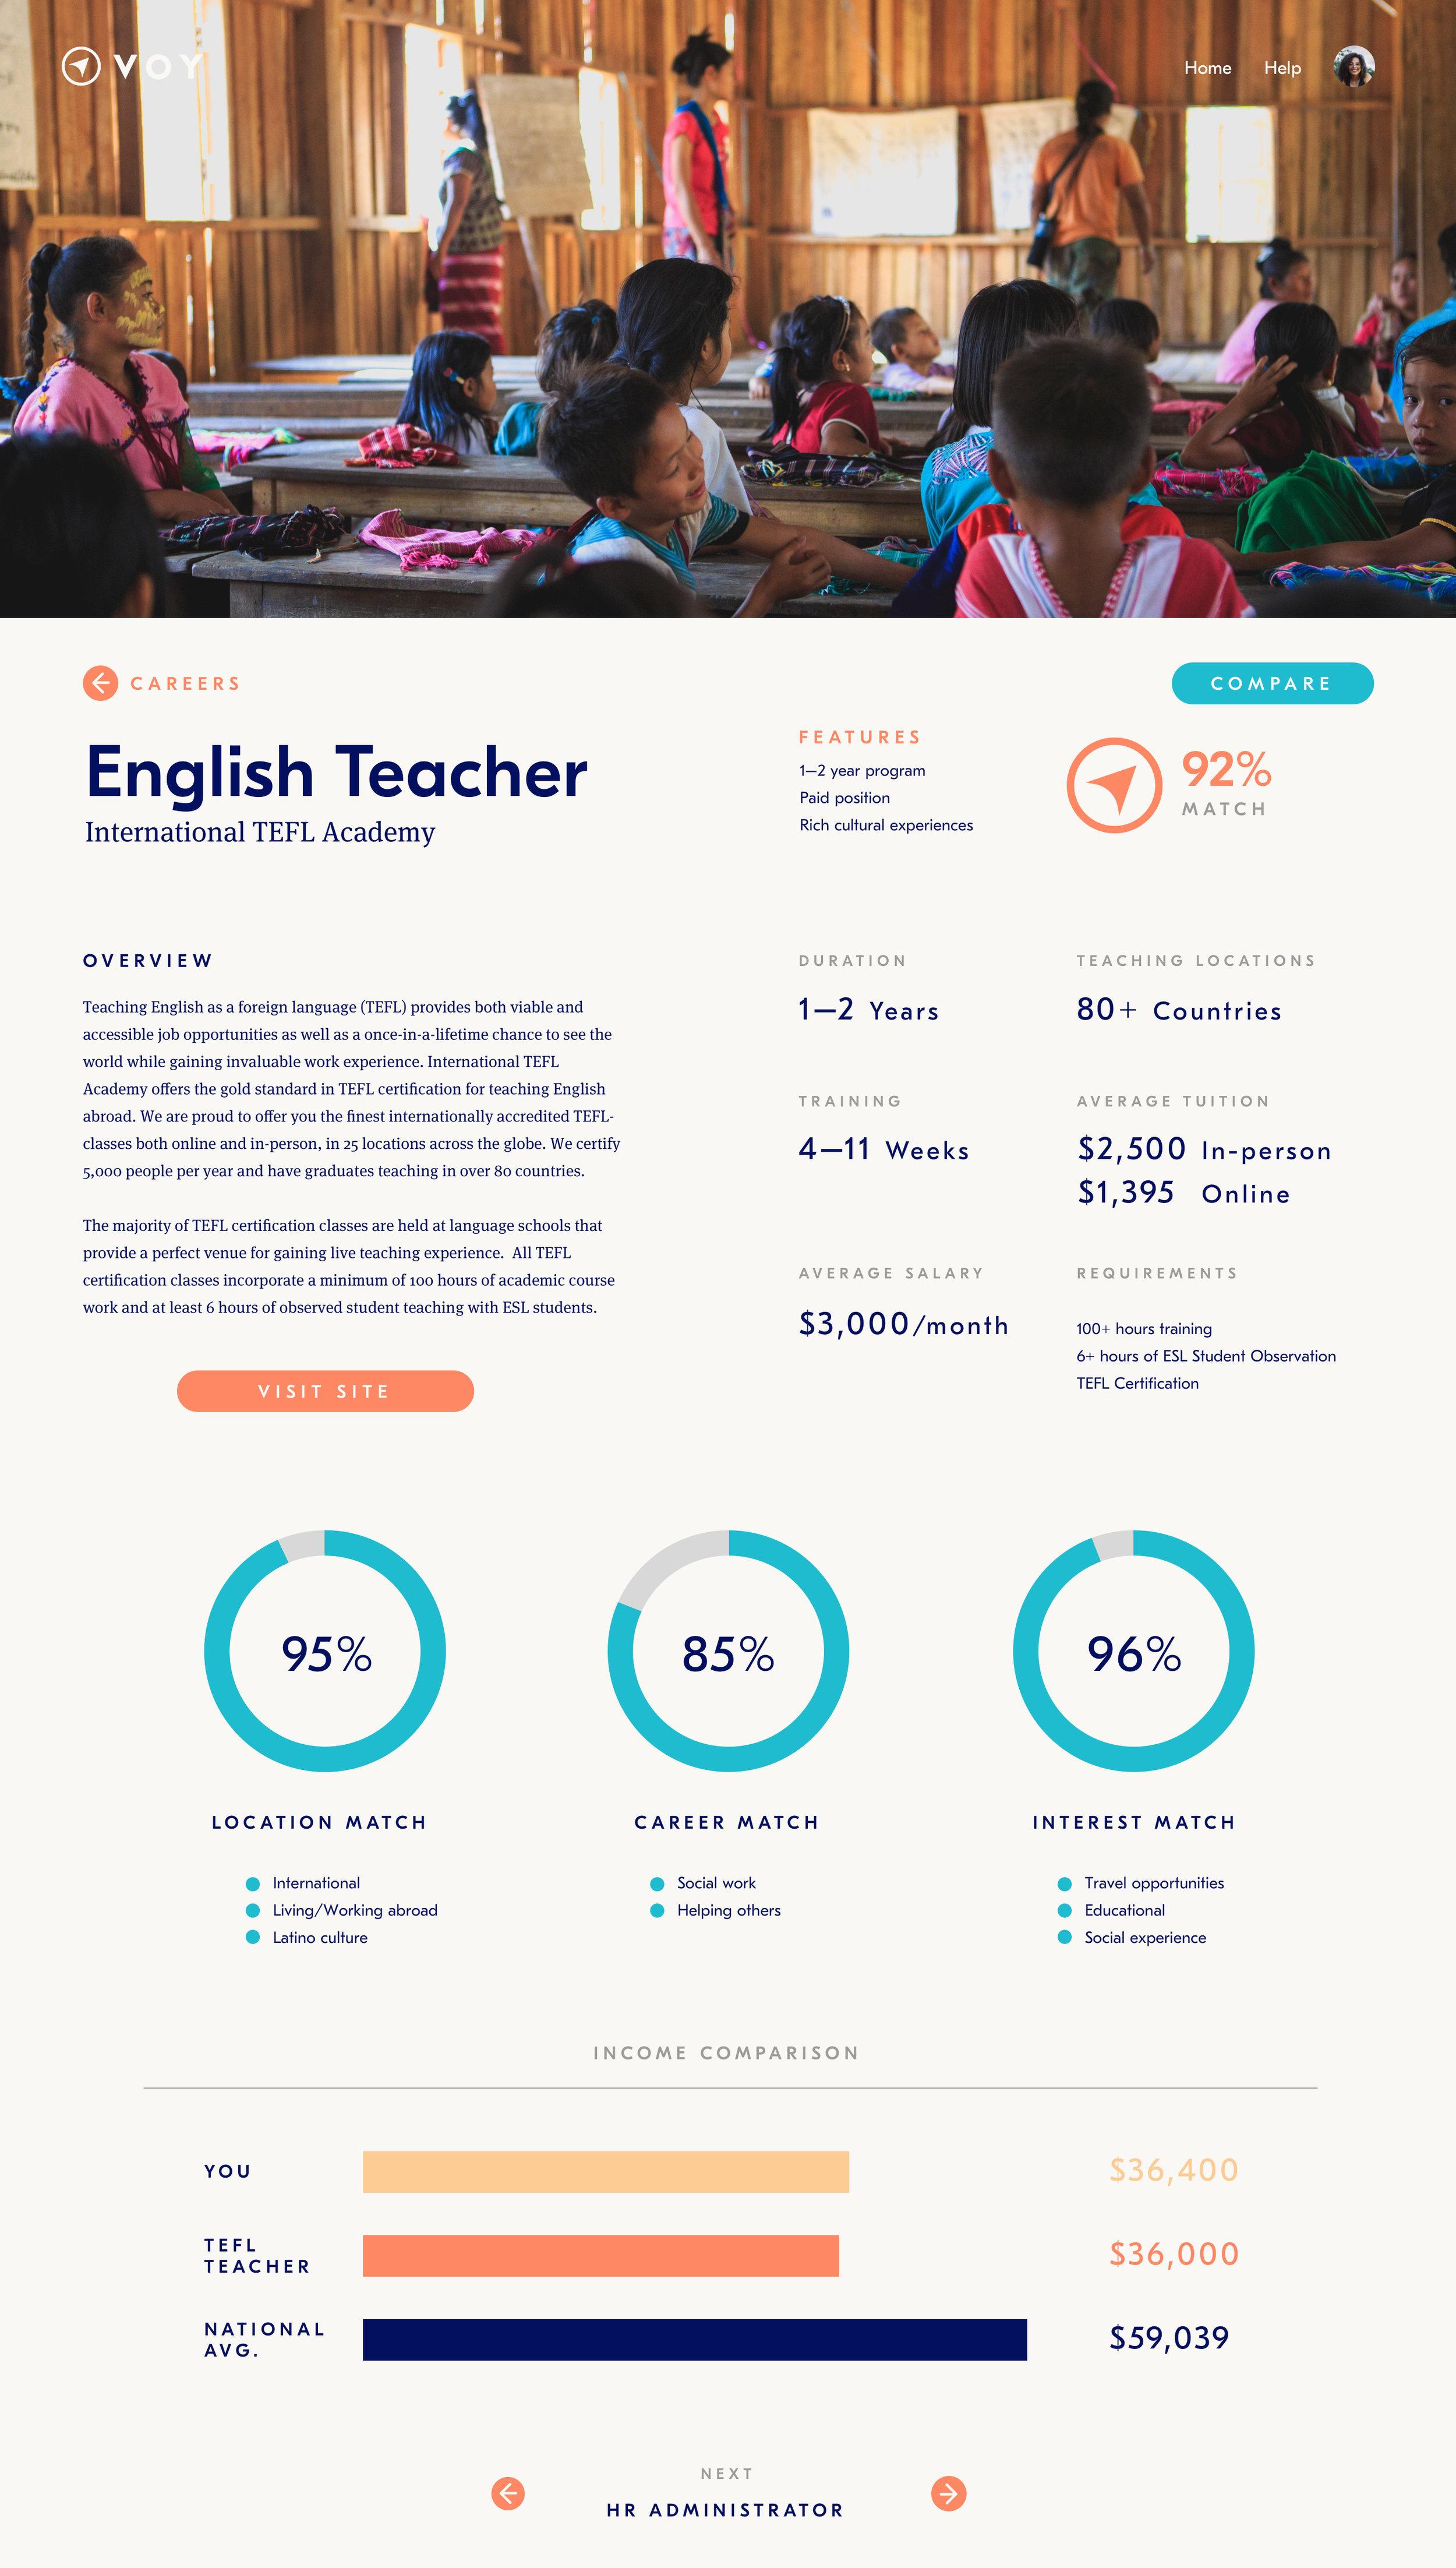 TEFL Teacher Full Page.jpg